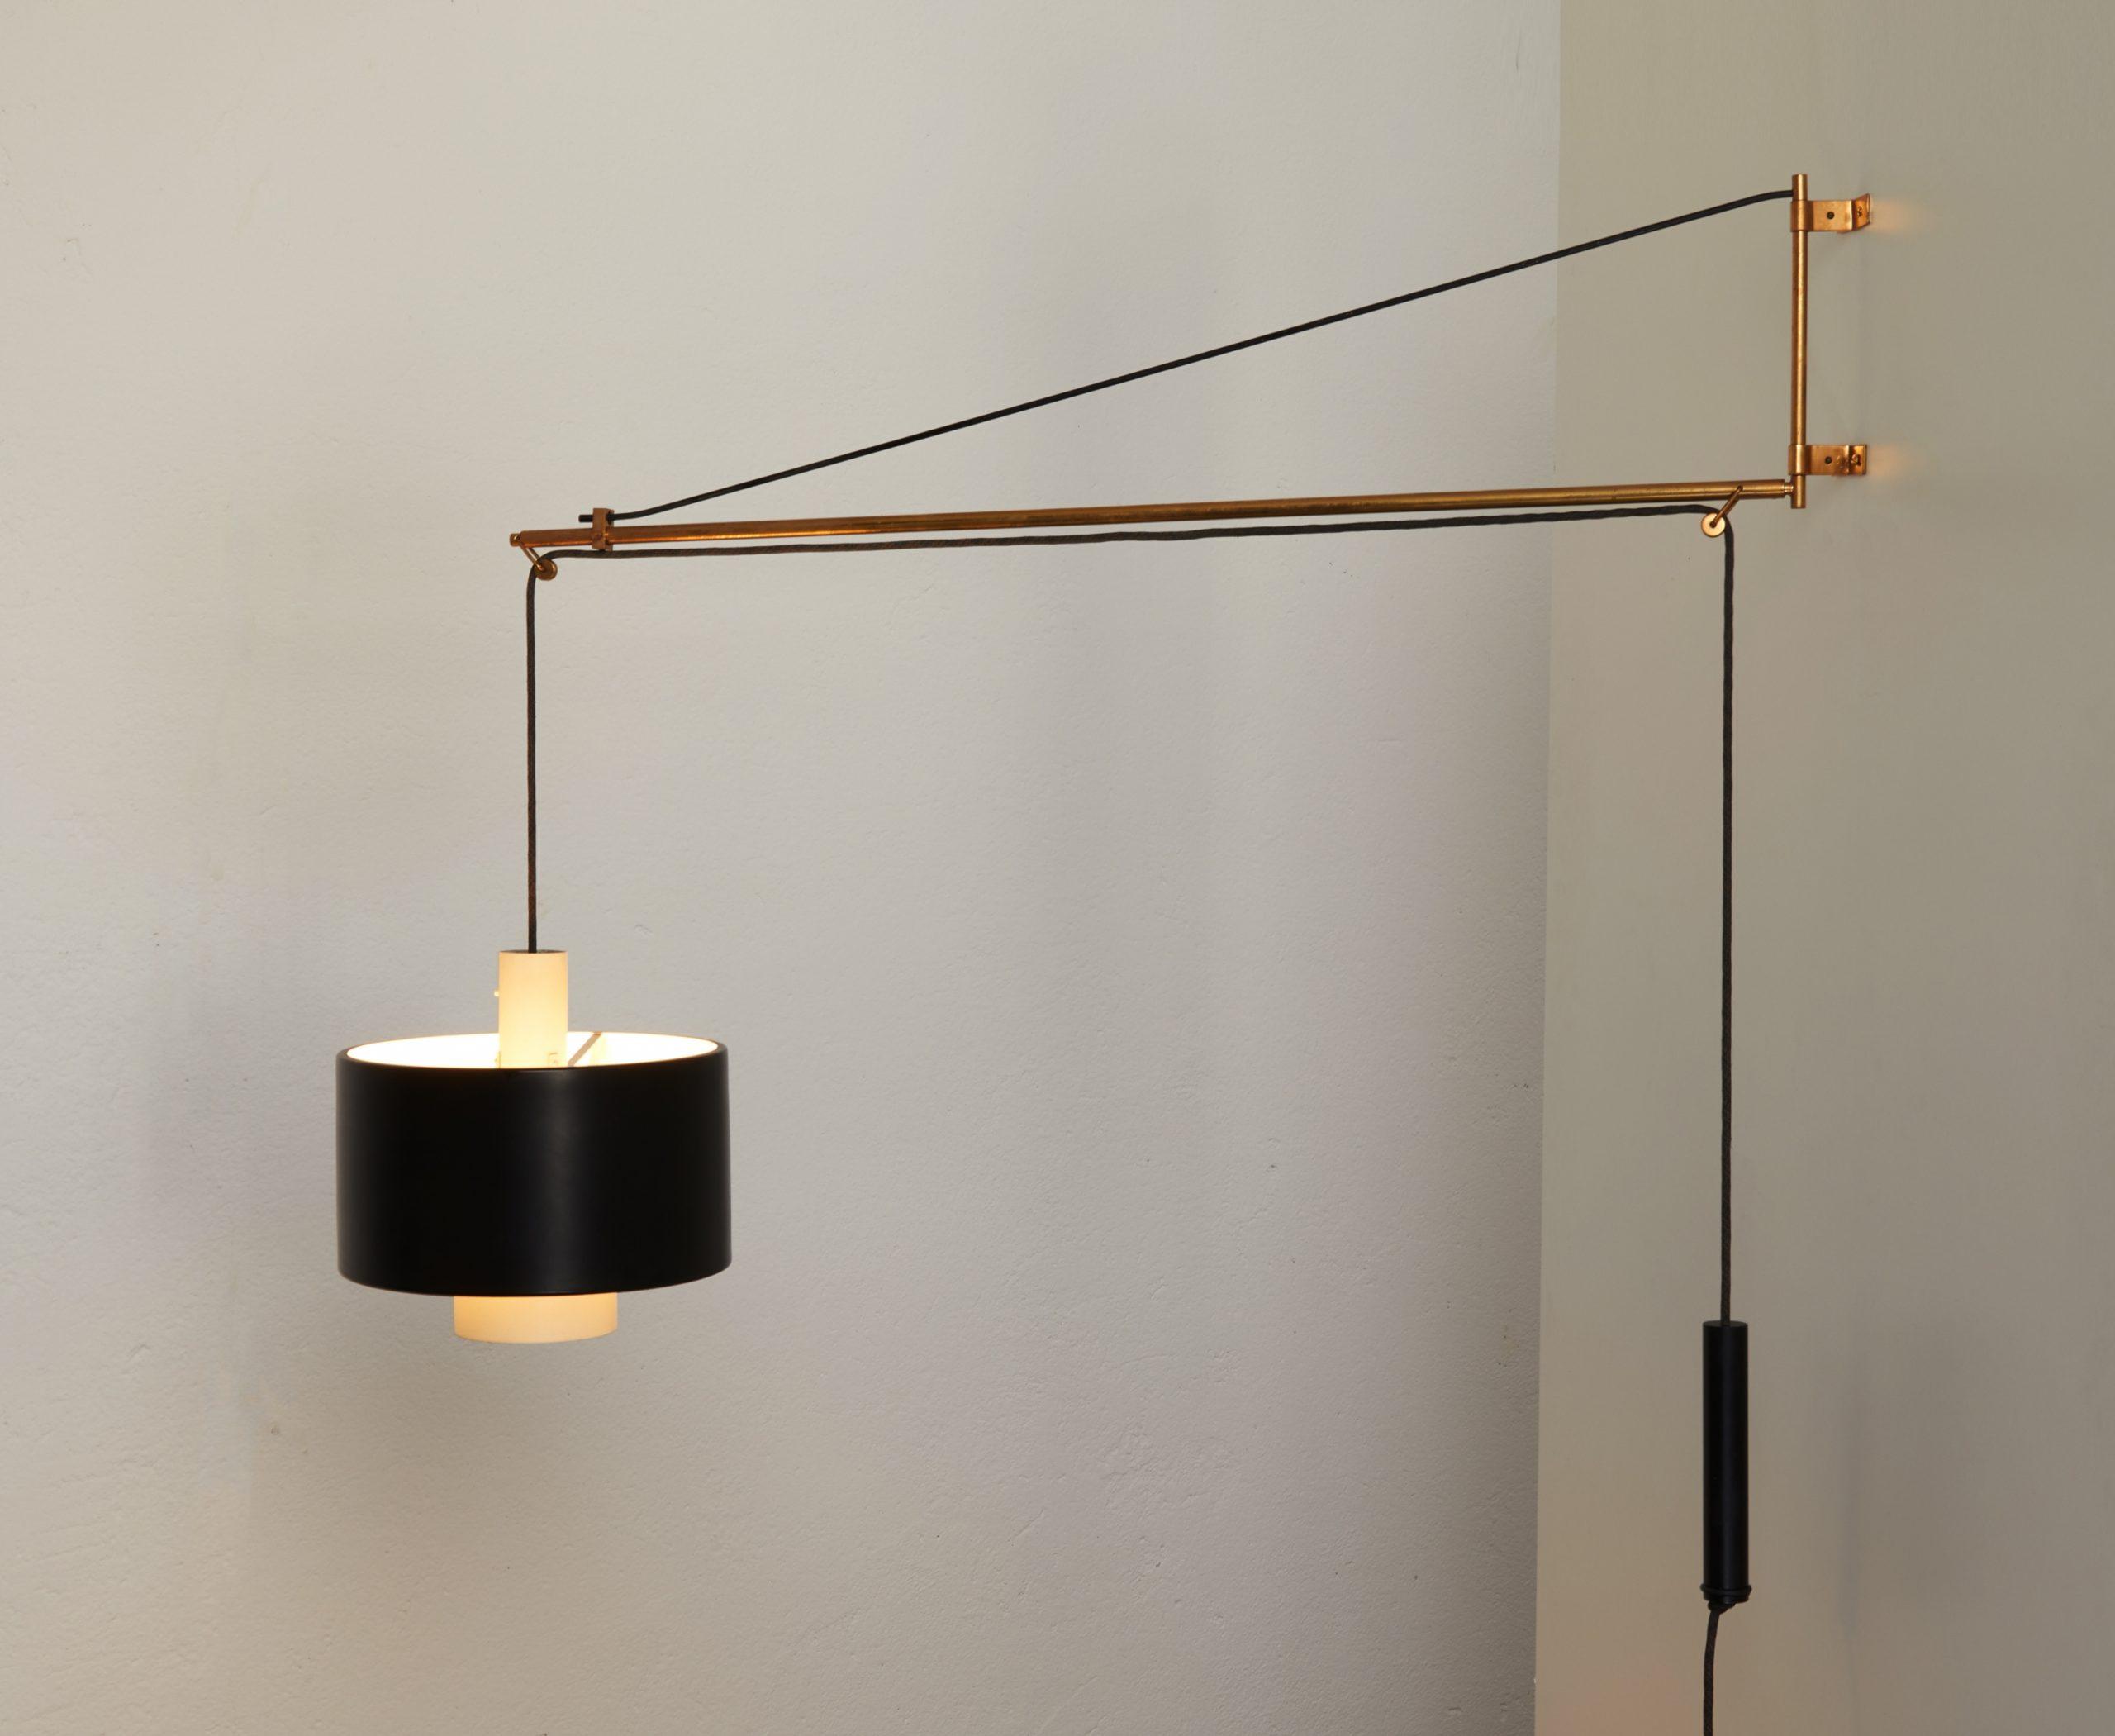 brass-wall-lamp-model-2061-by-gaetano-scolari-for-stilnovo-1954-image-08